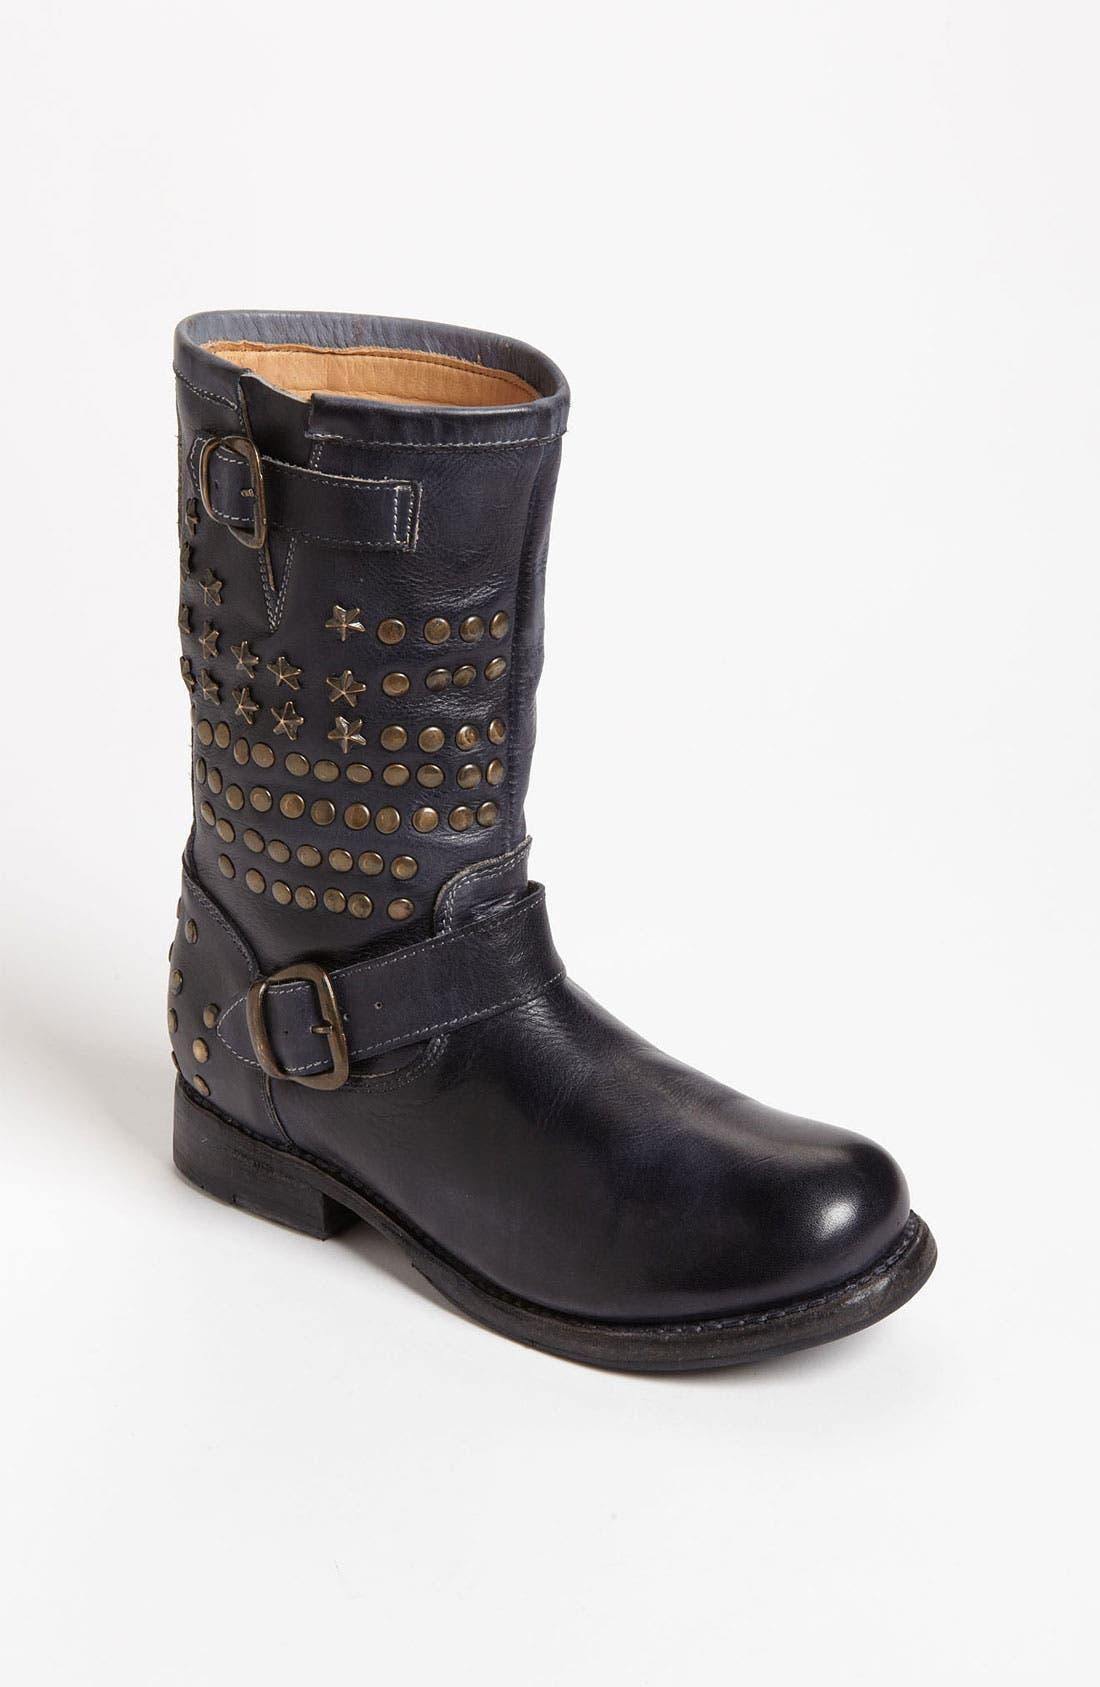 Main Image - Bed Stu 'Whacky' Boot